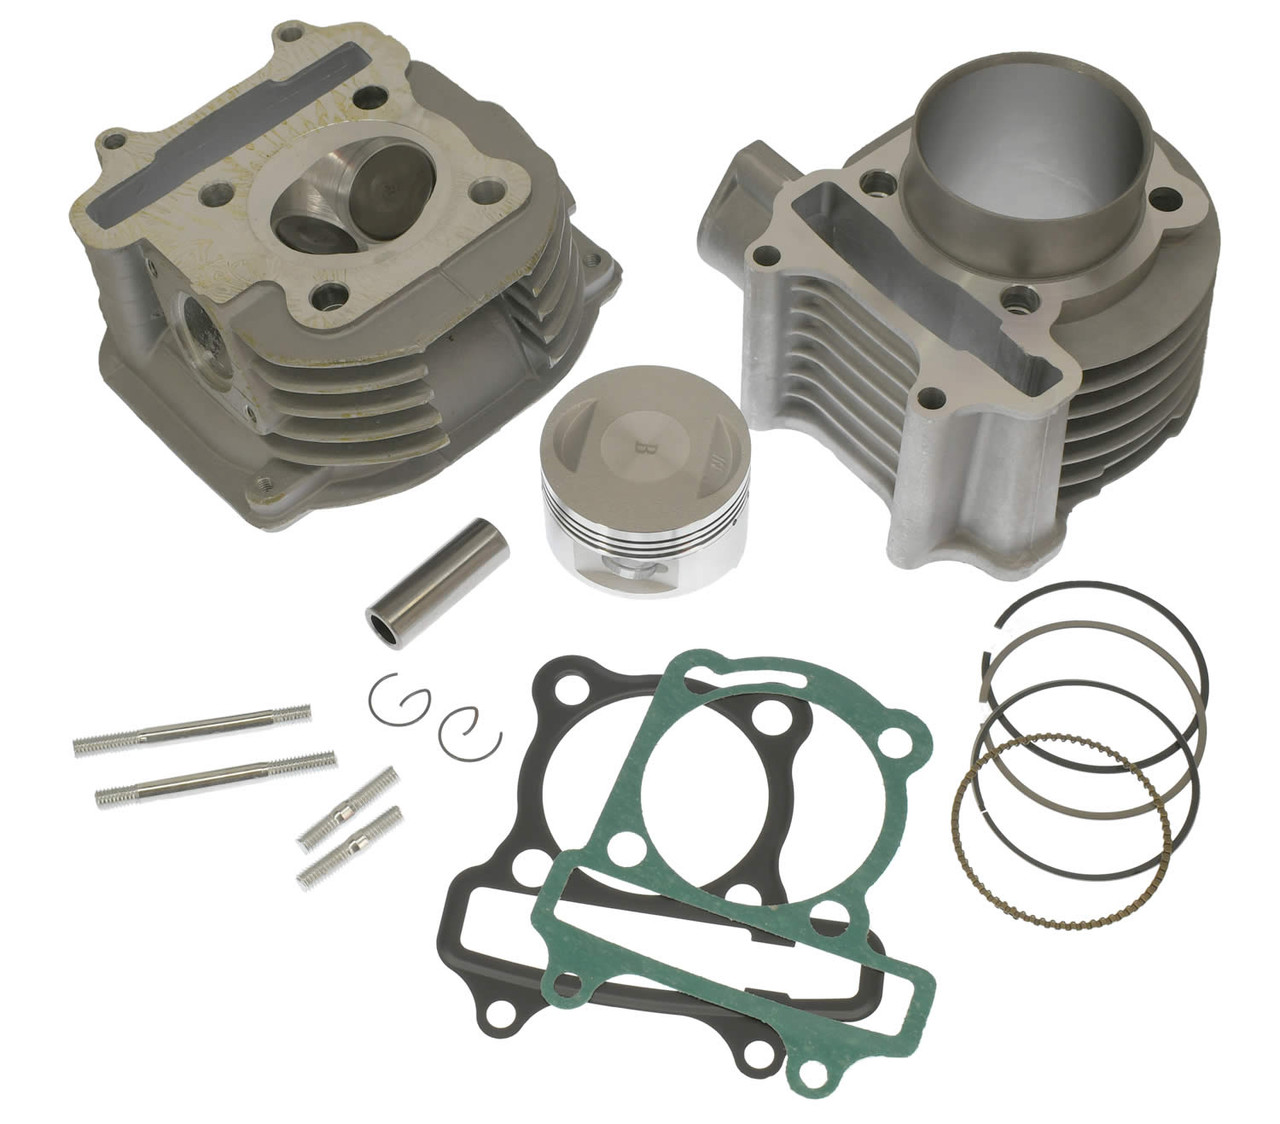 150cc Engine Rebuild Kit (ultimate)